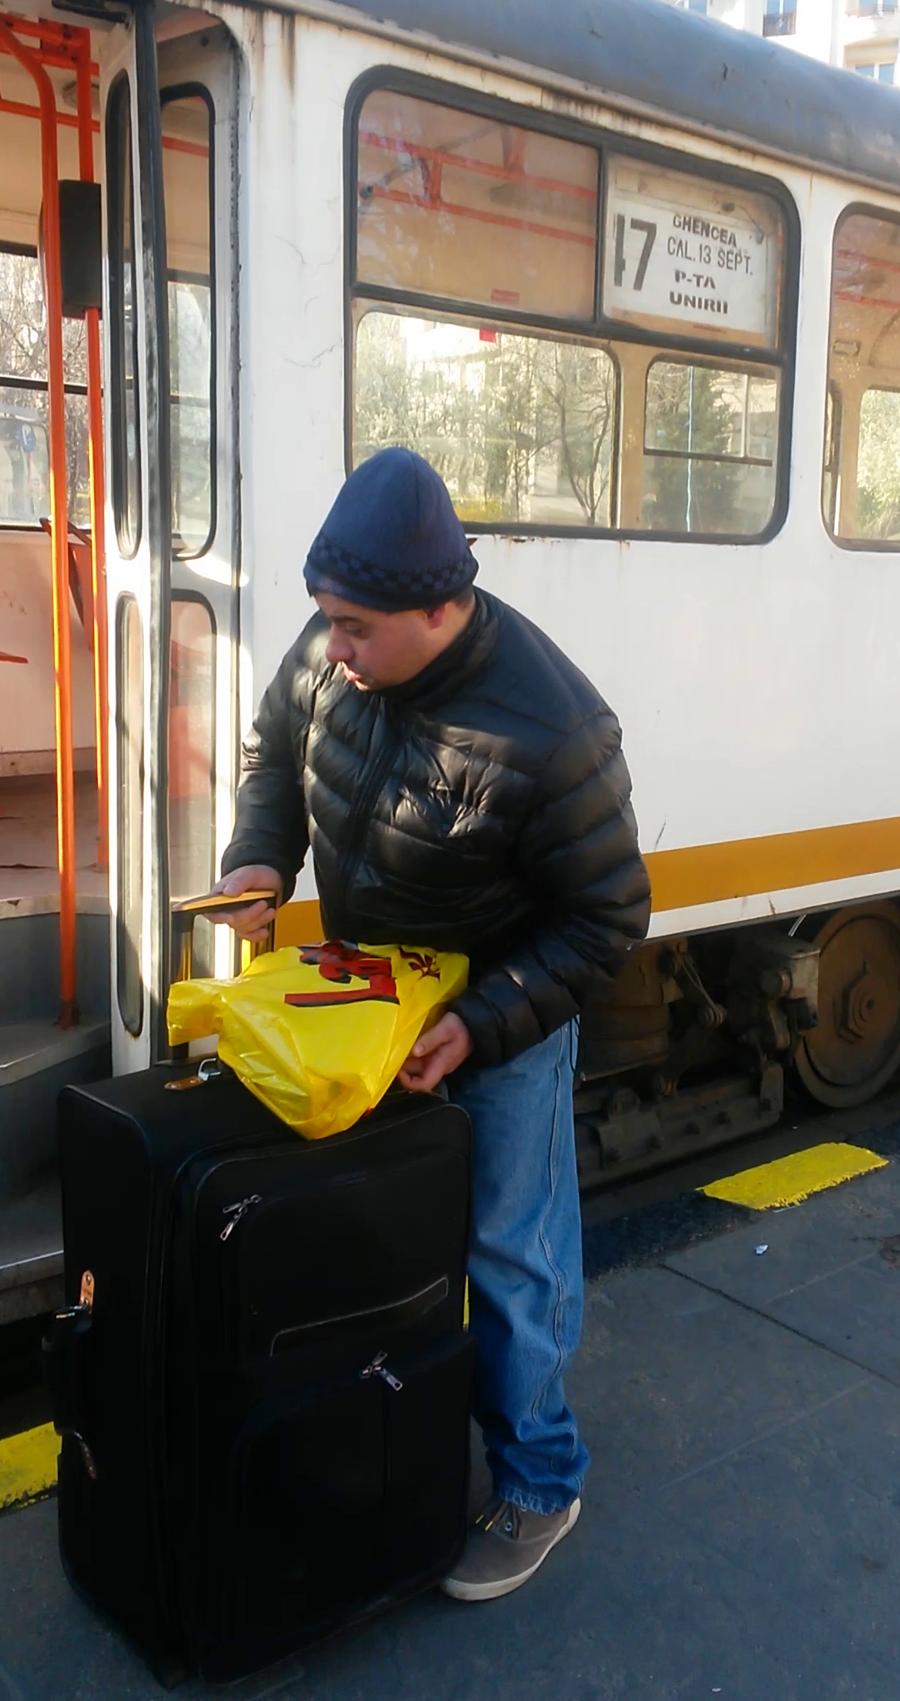 Chiar daca in fata statiei erau mai multe taxiuri si el avea un bagaj foarte greu,Tudorel a luat tramvaiul